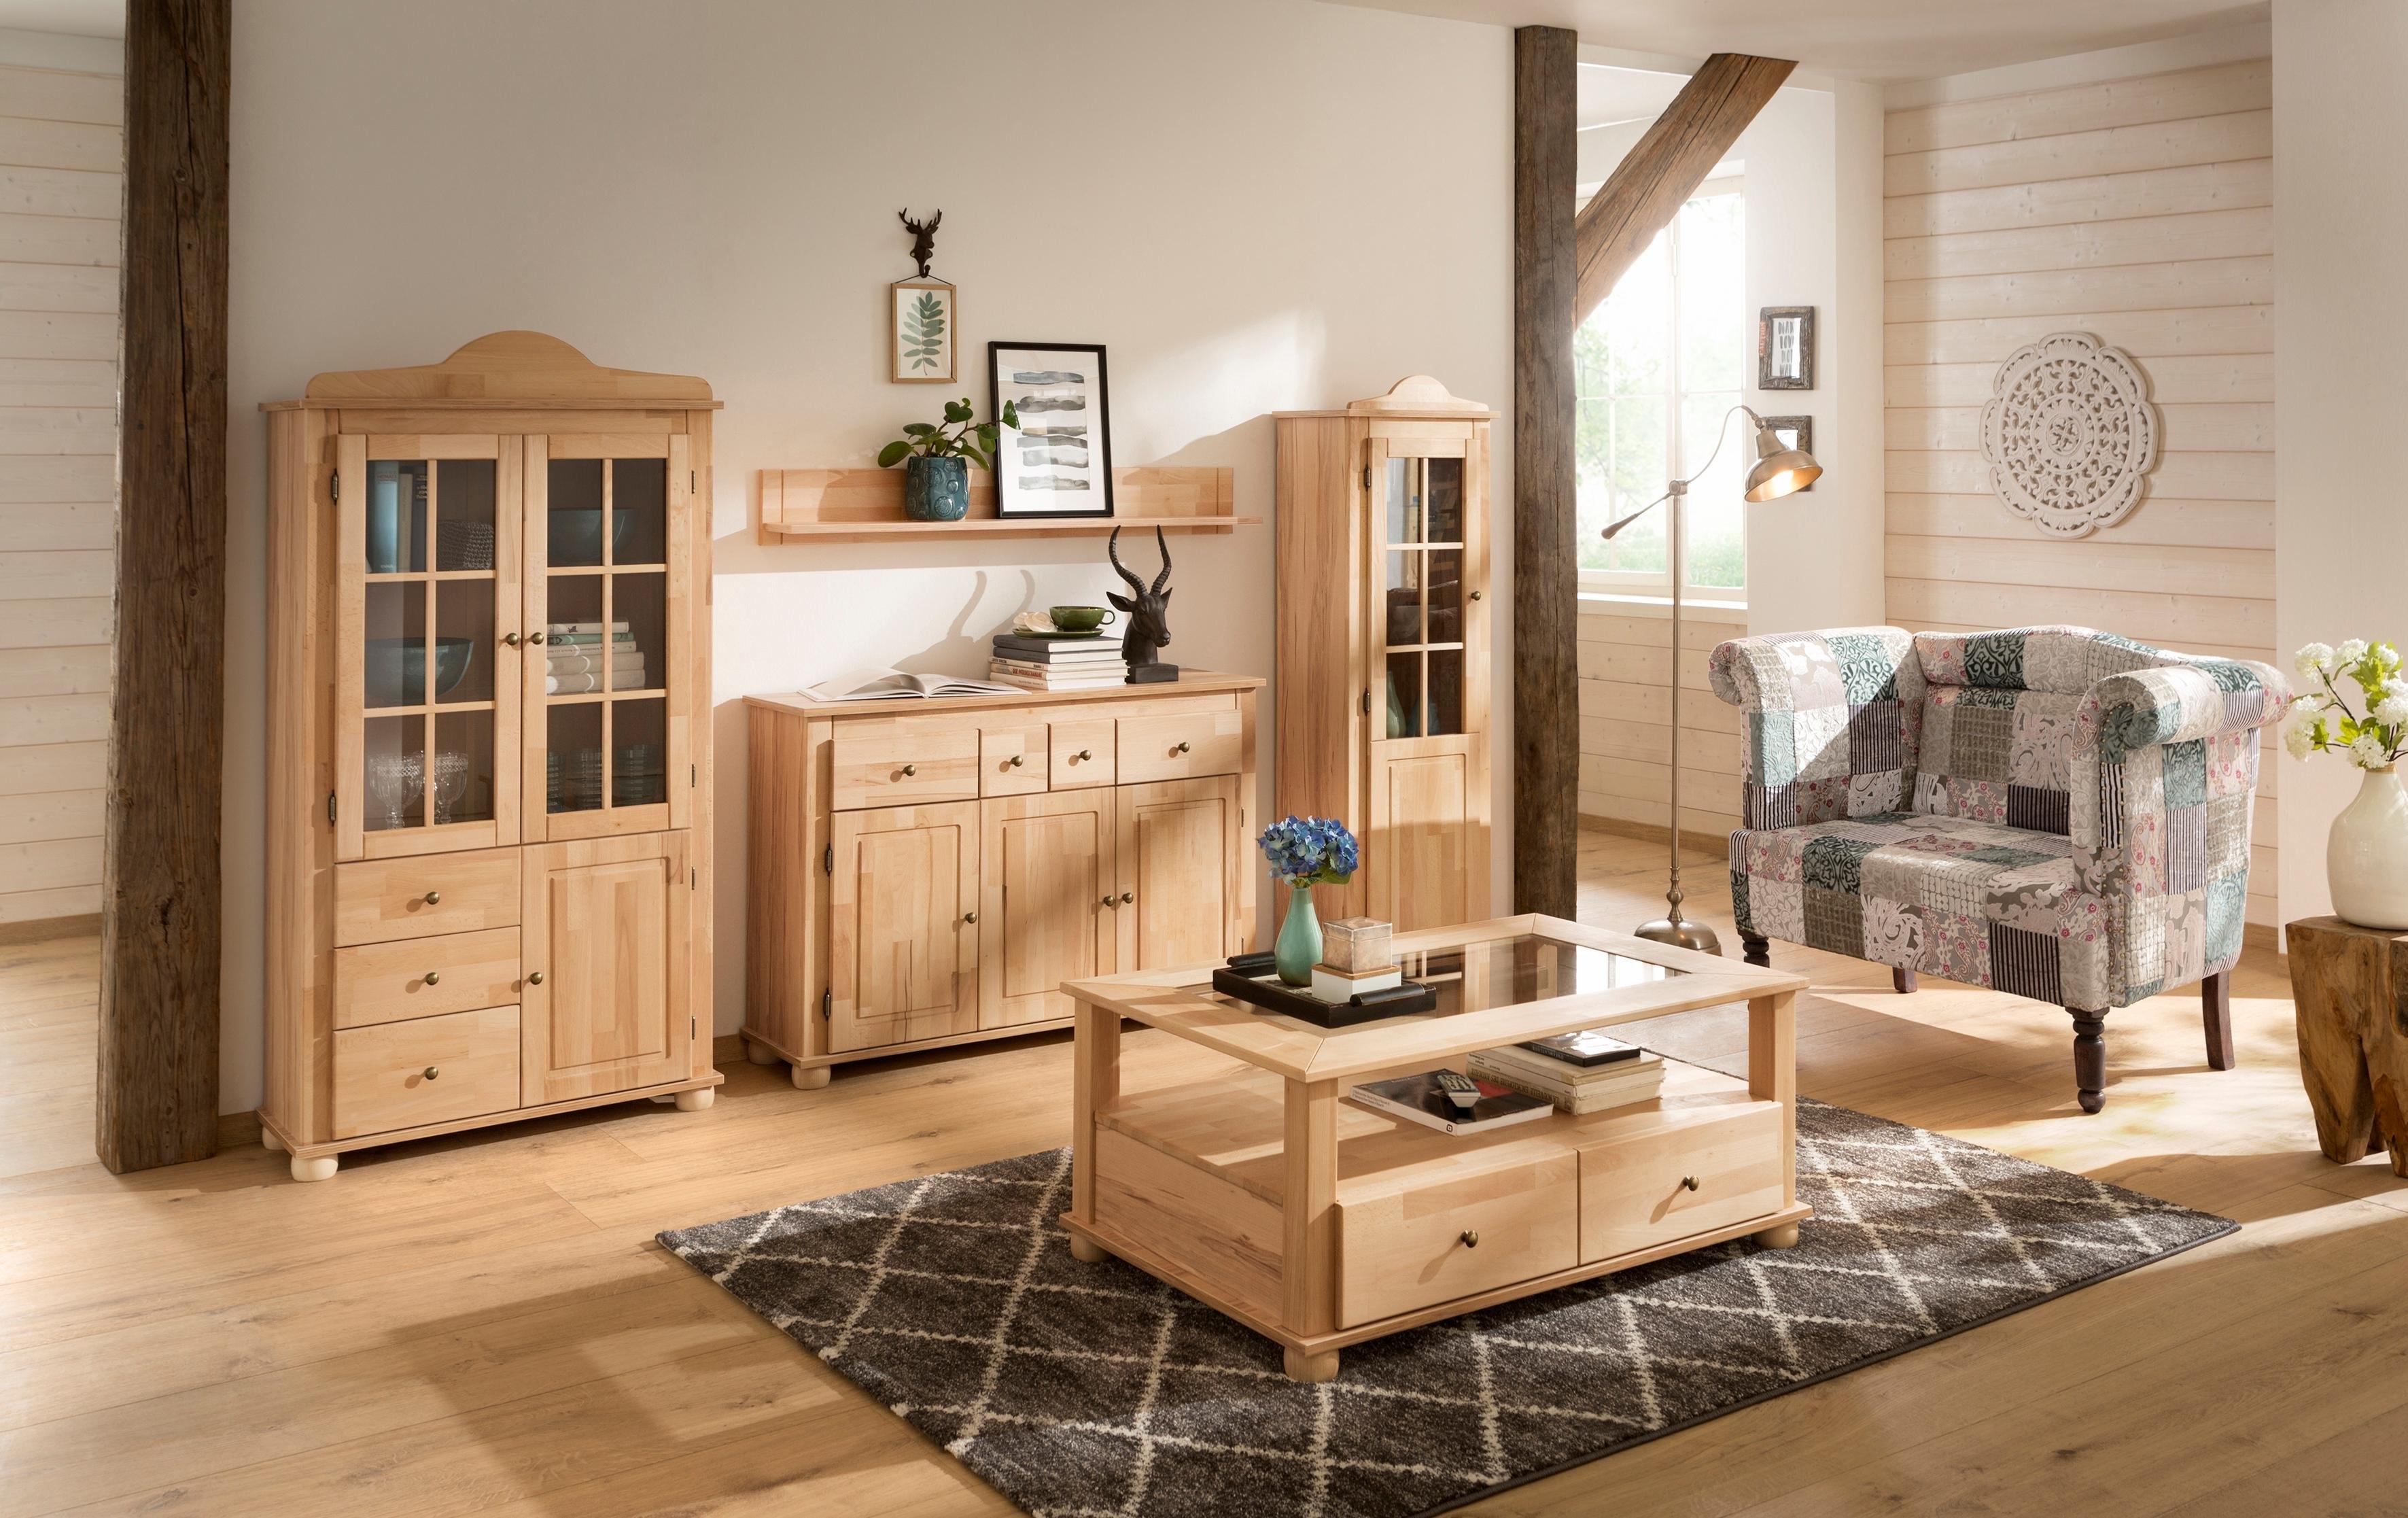 Design Hoge Kast : Home affaire hoge kast »pedro« hoogte 145 cm nu online bestellen otto